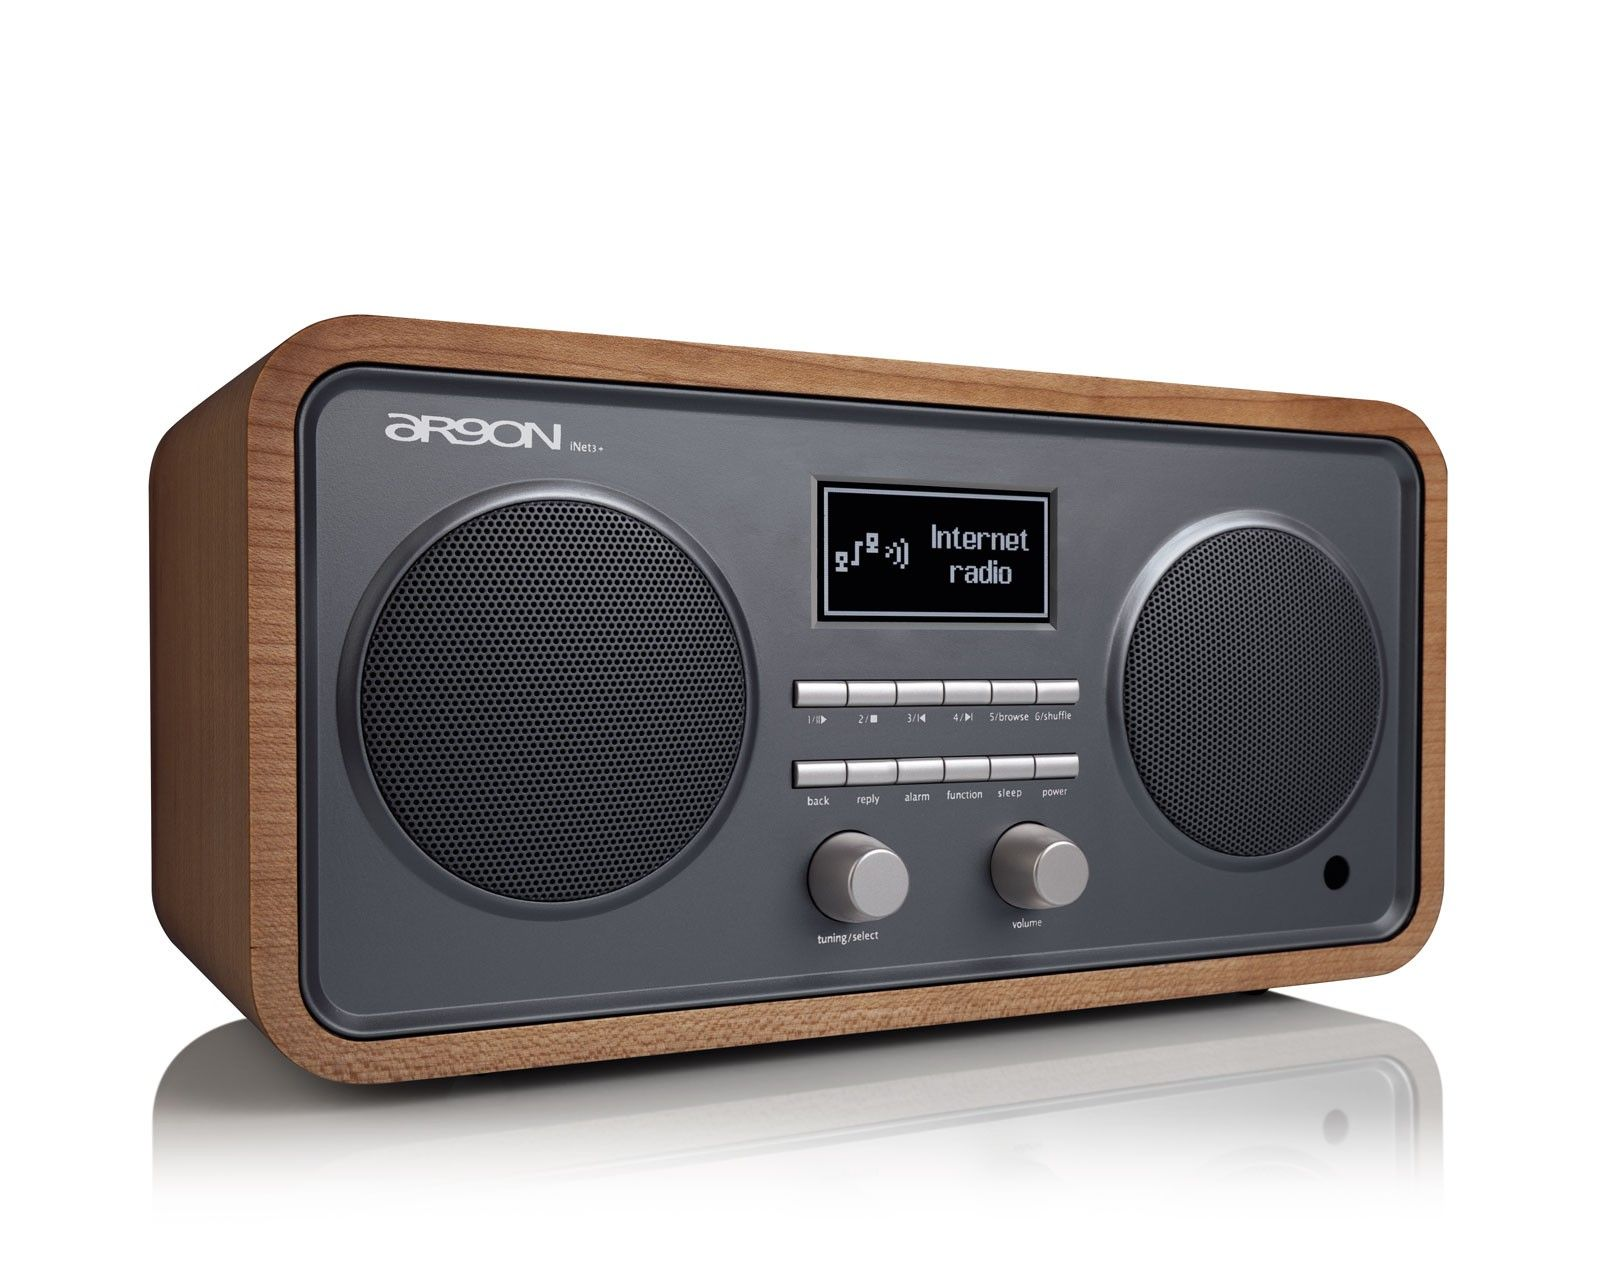 T 10153 12605 as well Ge 70s 80s Retro Woodgrain Clock Radio together with 128704501824537496 moreover Proton 320 Clock Radio in addition Tr82 Dab Retro Style Digital Radio Fmam. on old style clock radios